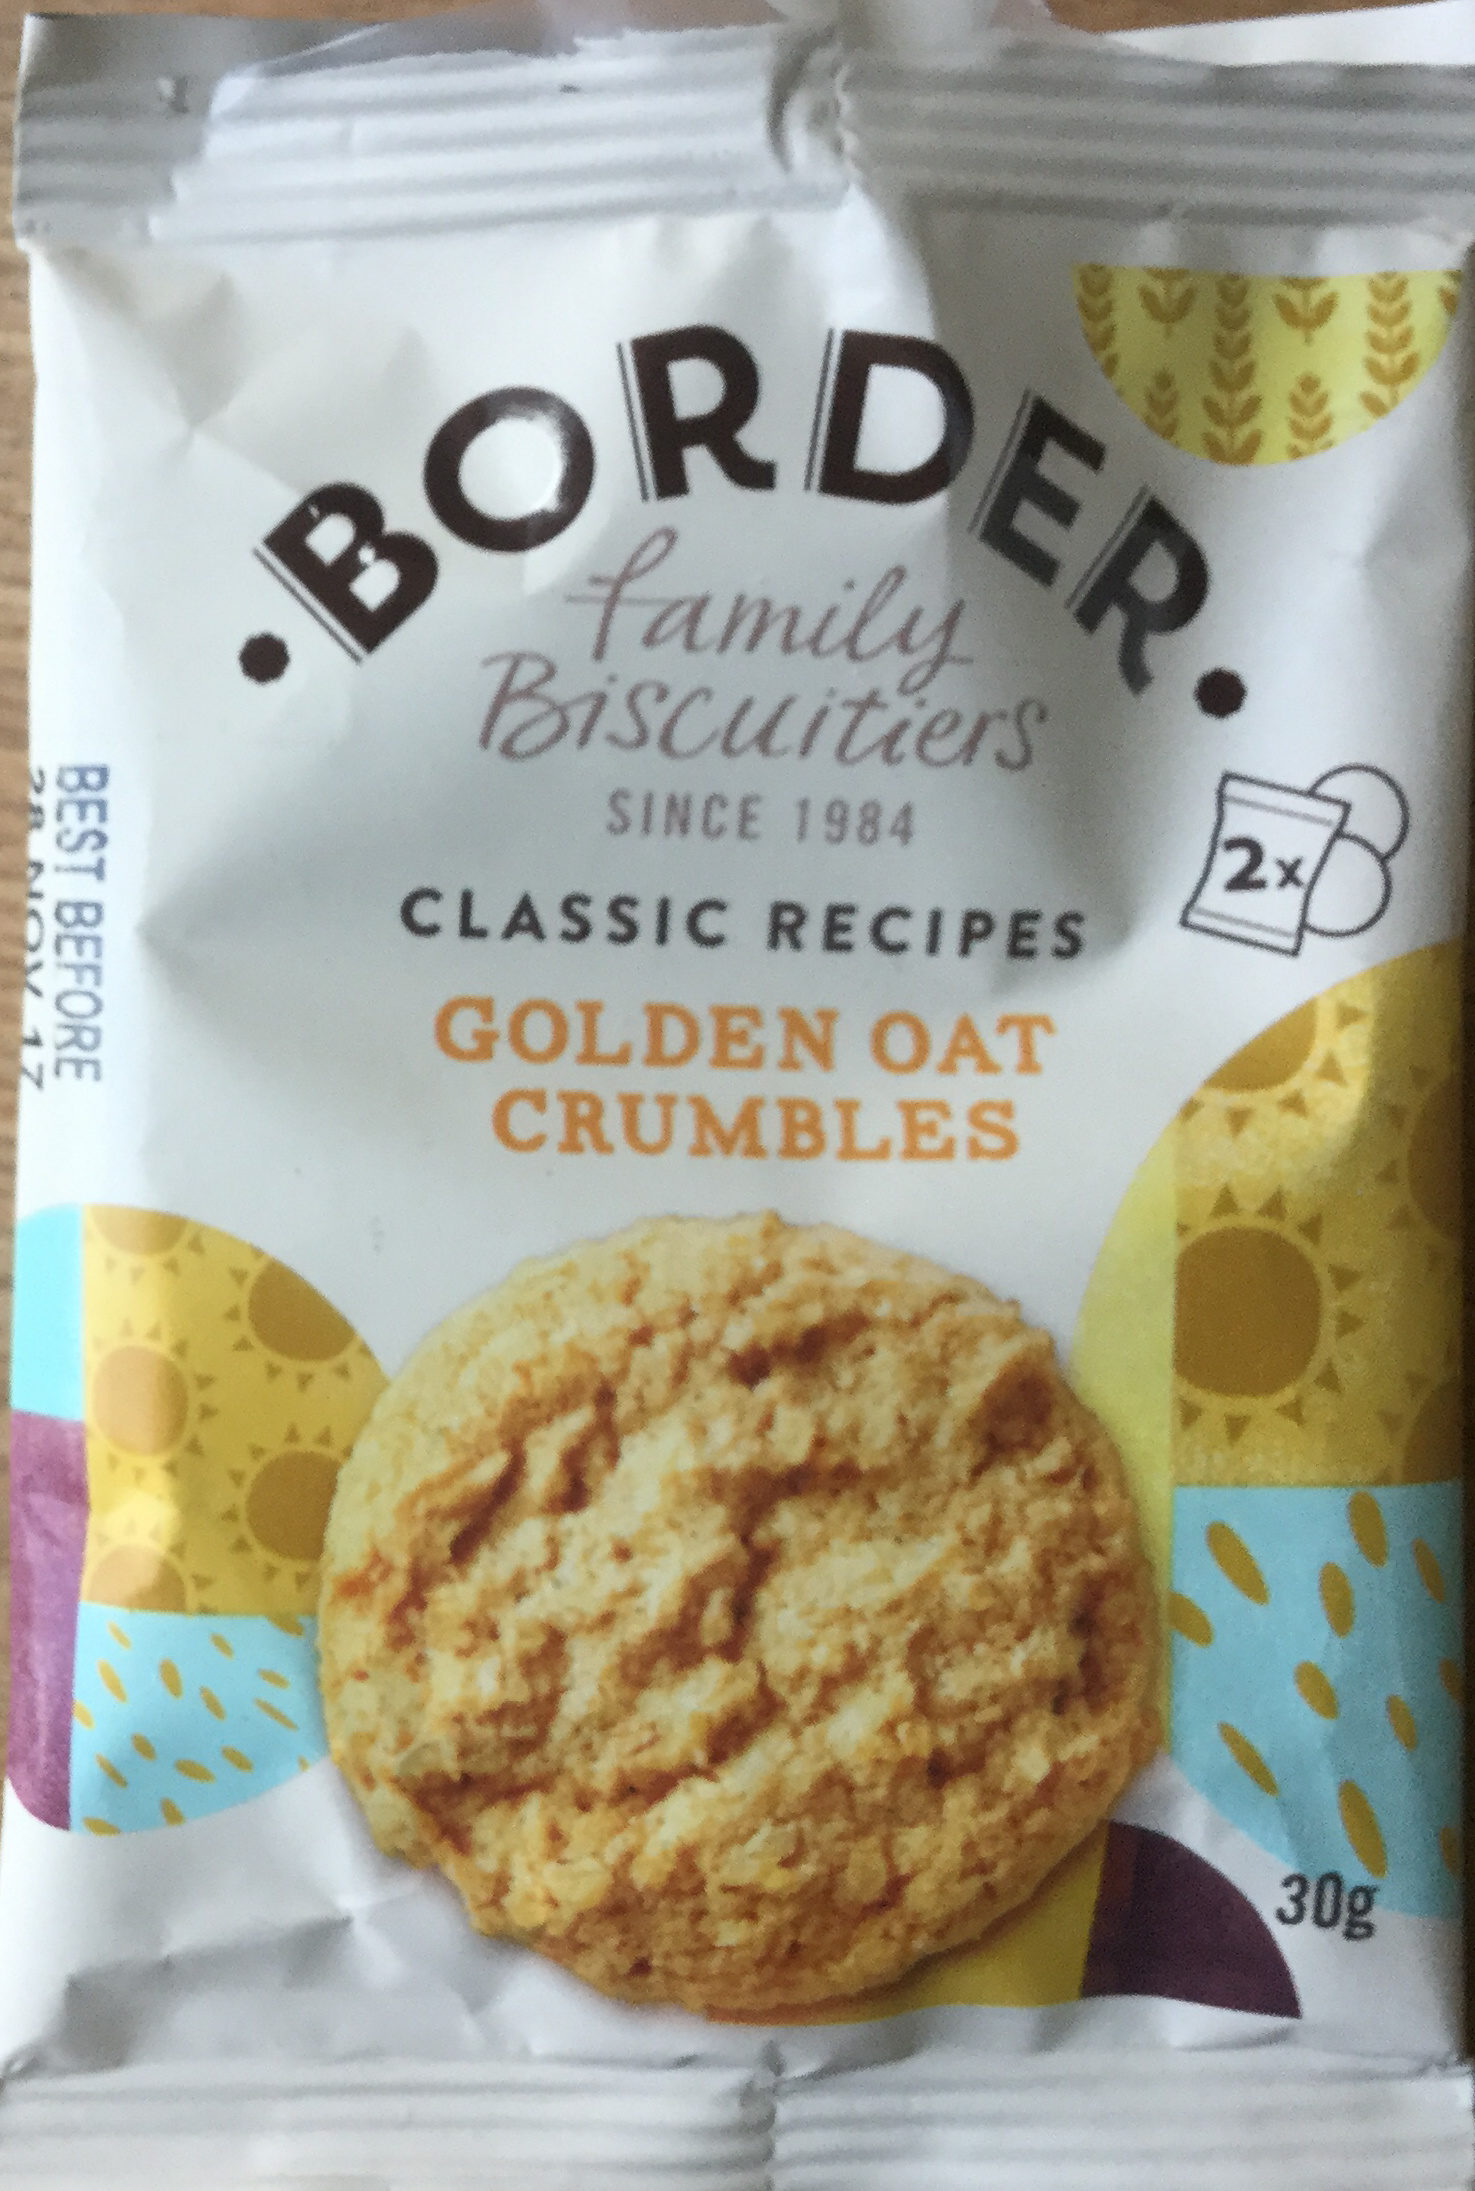 Golden oat crumbles - Product - en